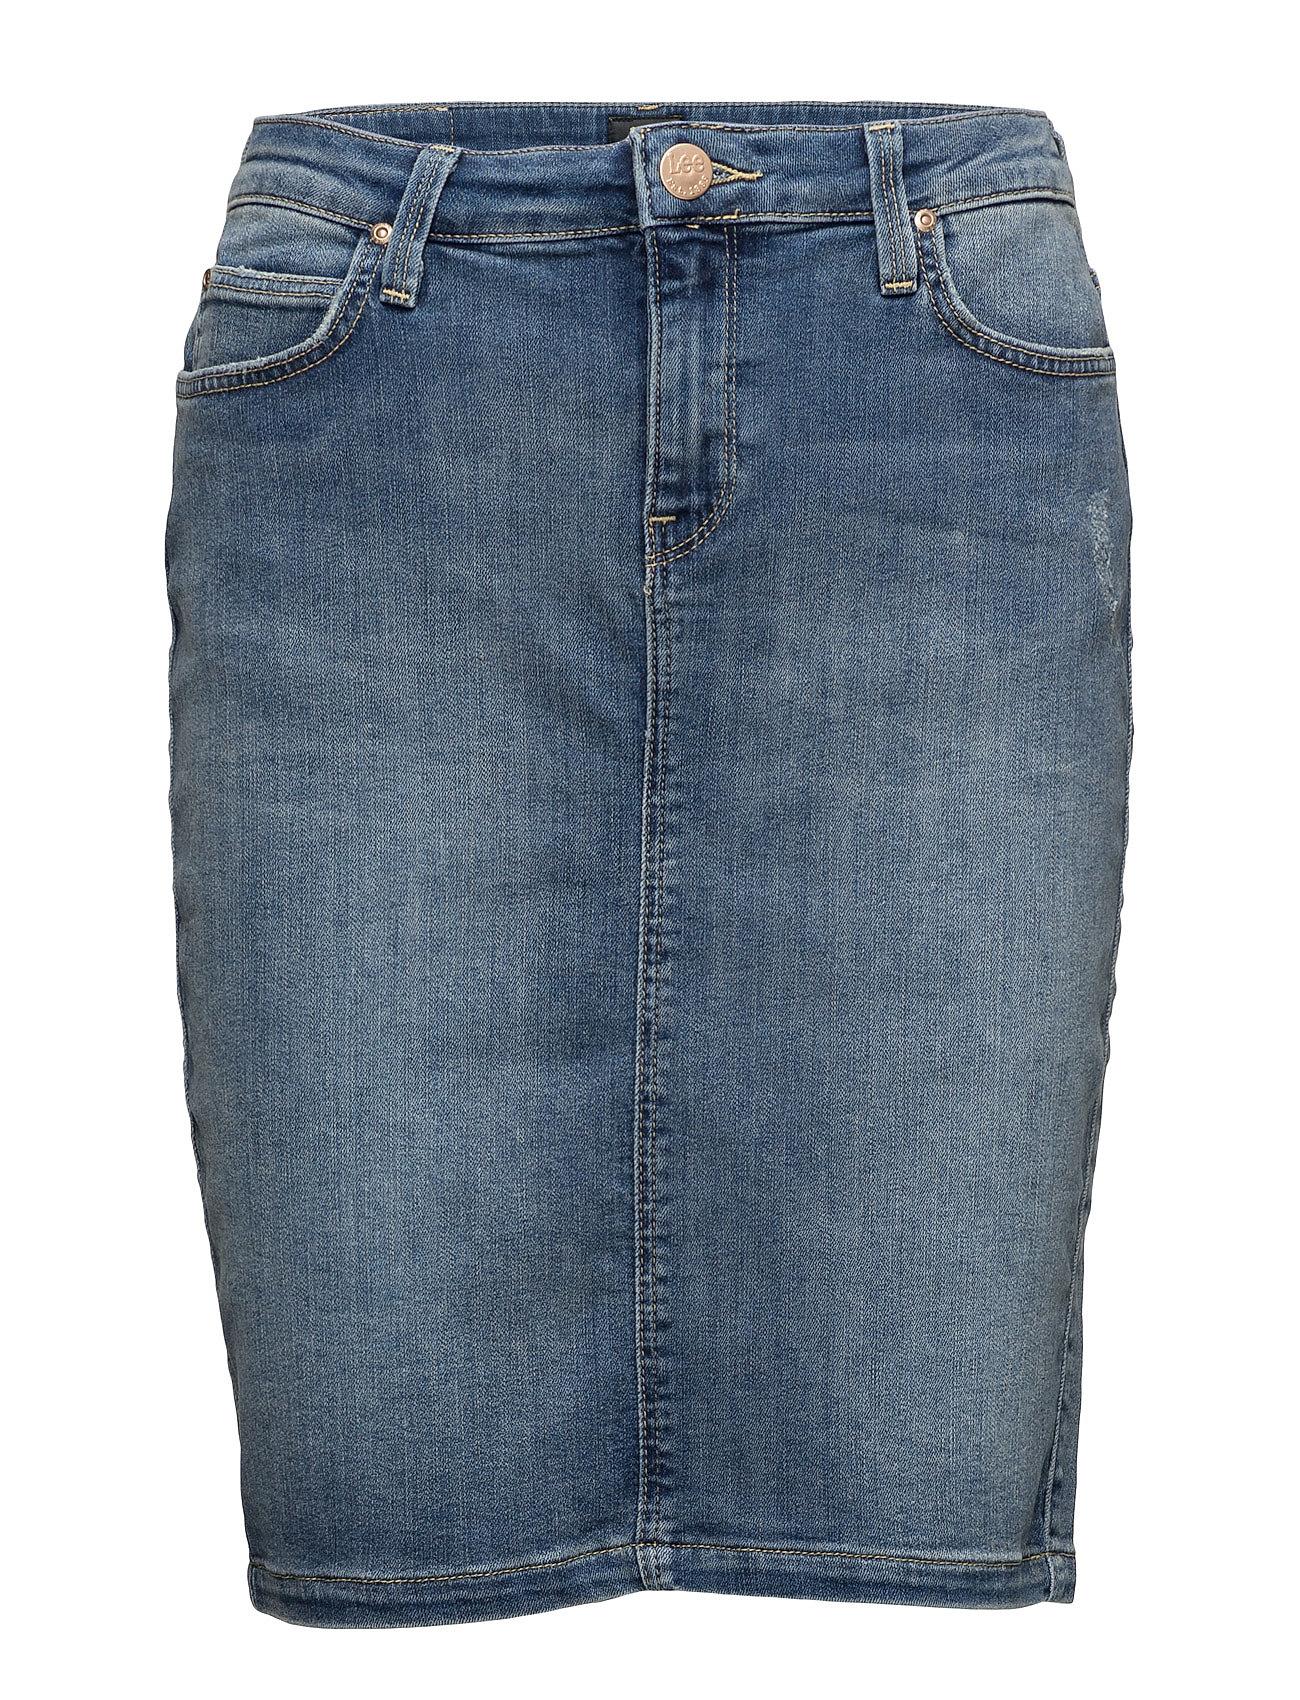 Pencil Skirt Lt Urban Indigo Lee Jeans Skirts thumbnail